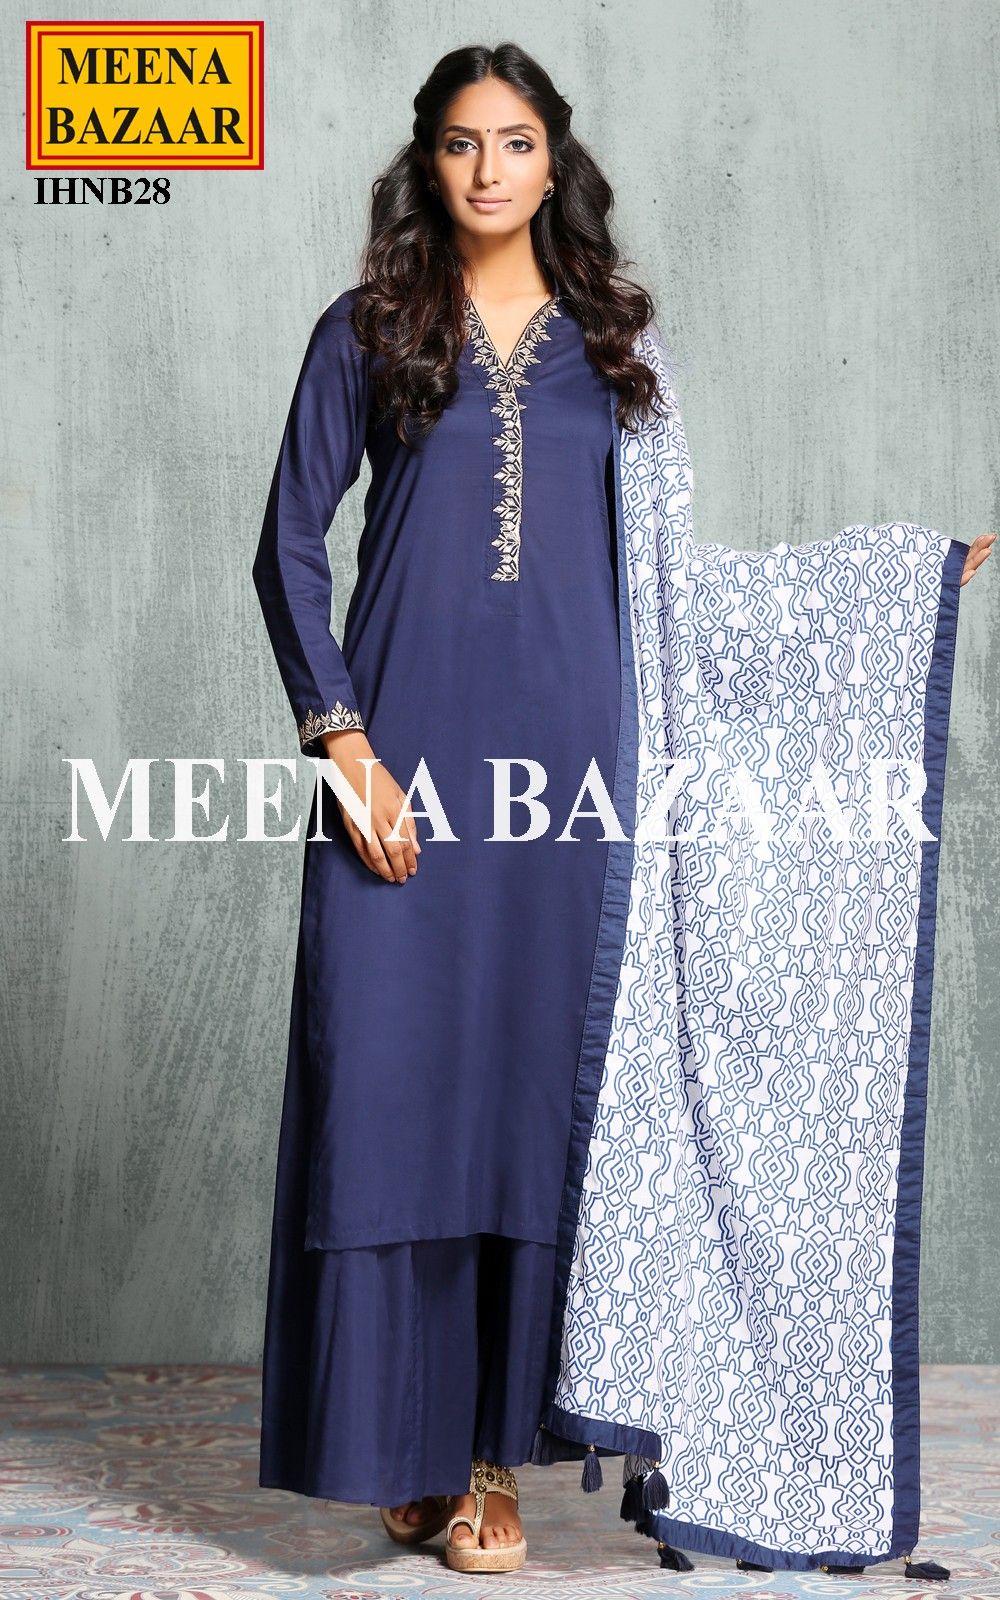 Blue Kalidar Sharara Suit Online Shopping For Ethnic Wear Buy Jfashion Etchnic Long Tunik Fashion Elegan Shareen Designer Sarees Lehengas Anarkali Suits Salwar Suitskurtisgowns Meenabazaarcom